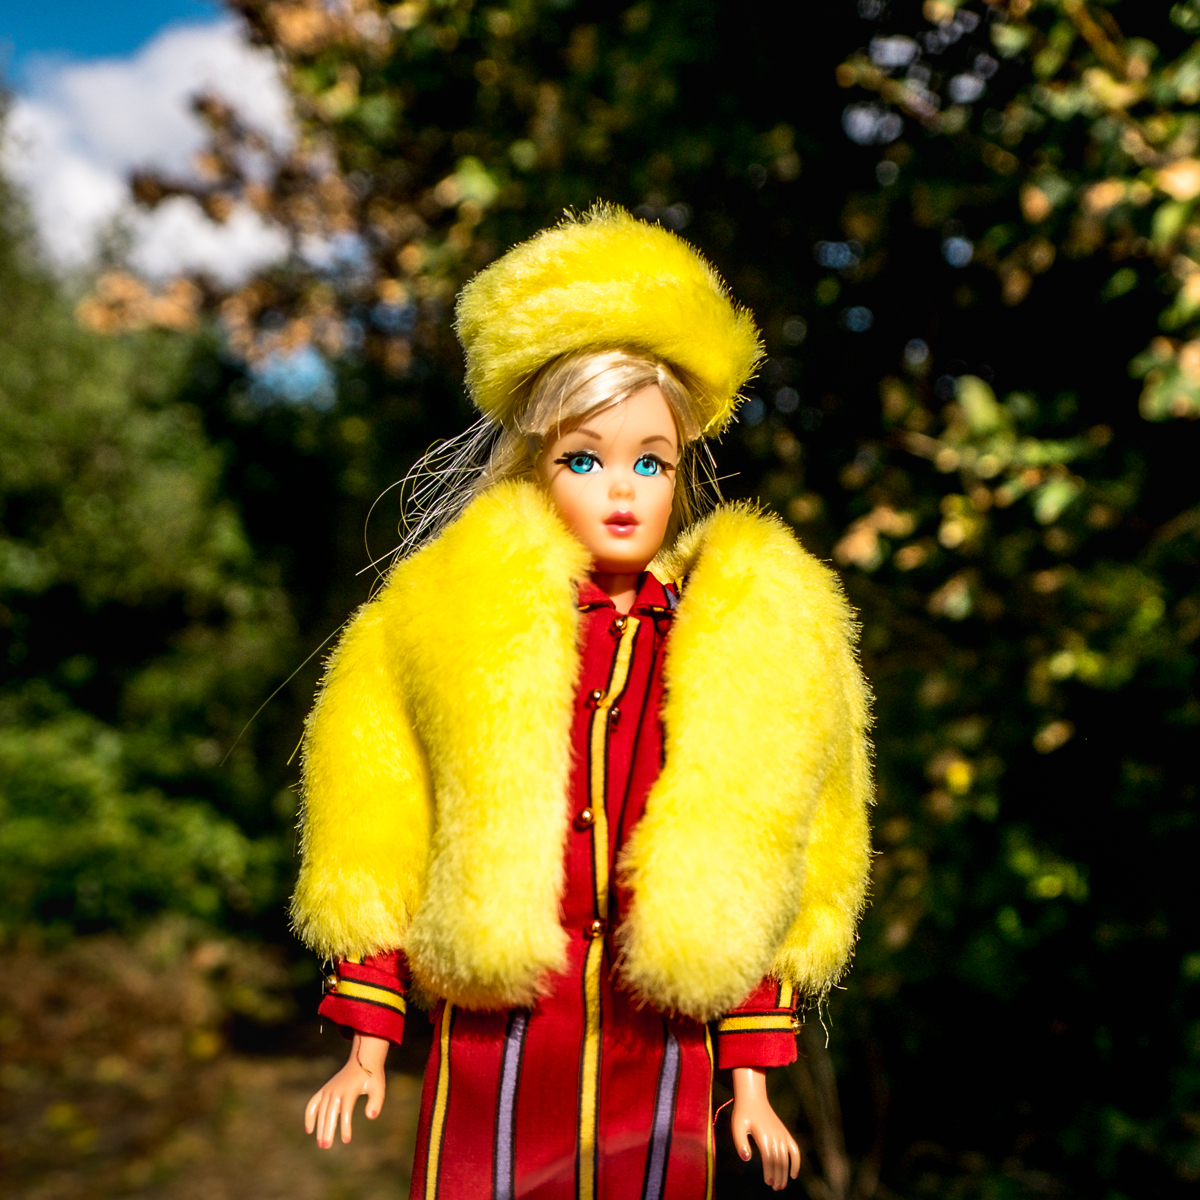 20161005_Greenwich_Oxleas-Wood_Barbie-does-Oxleas